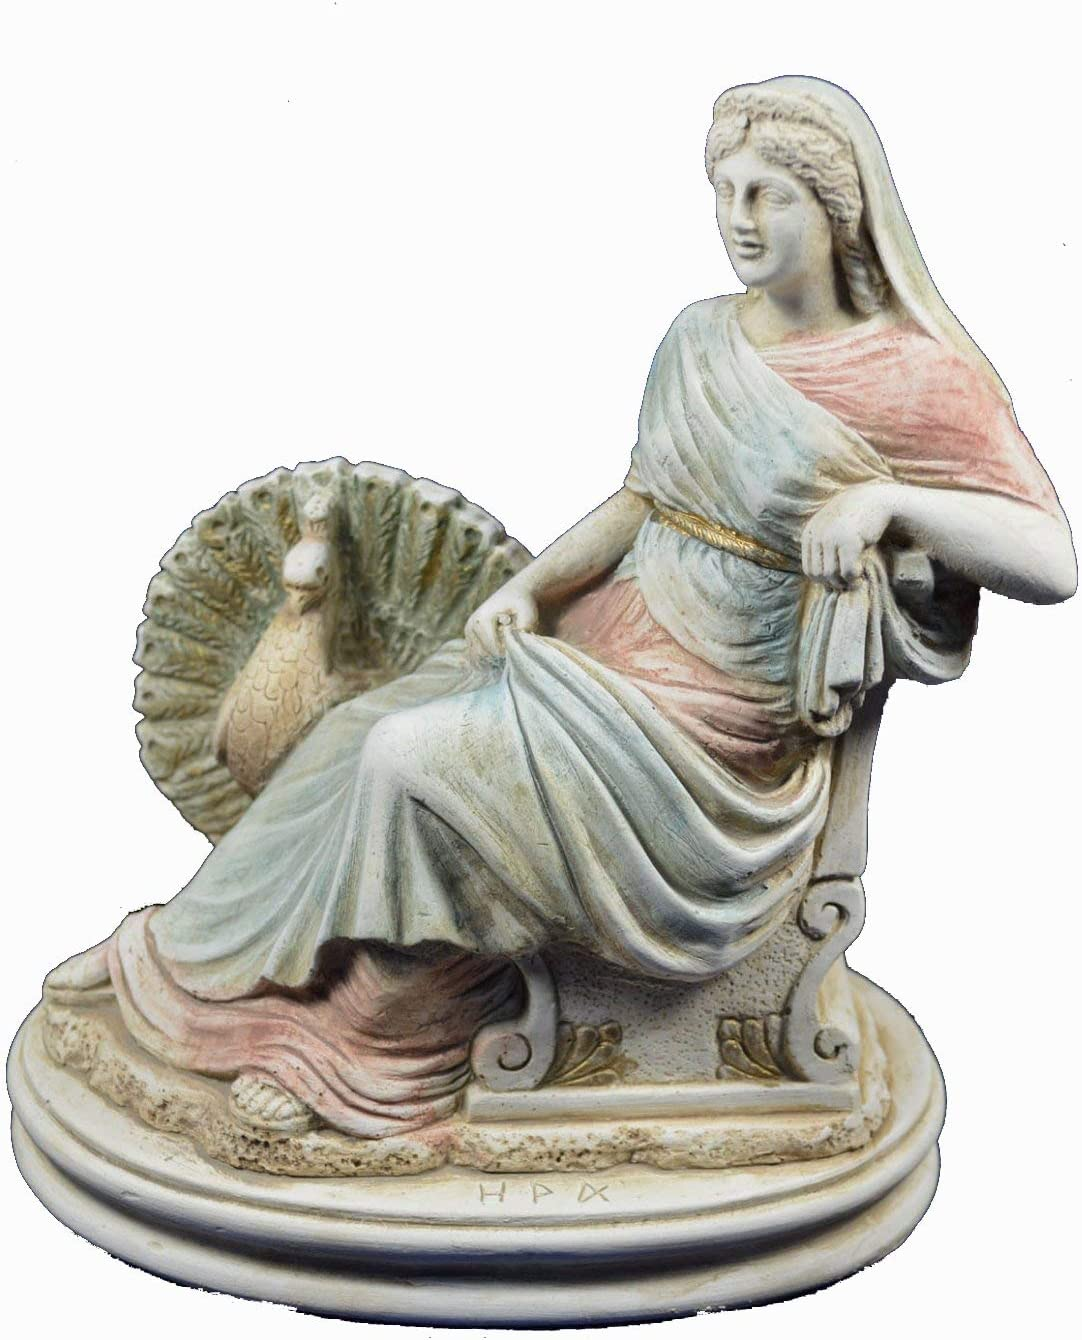 Estia Creations Hera Sculpture Ancient Ranking TOP6 Greek Women of Purchase Goddess St